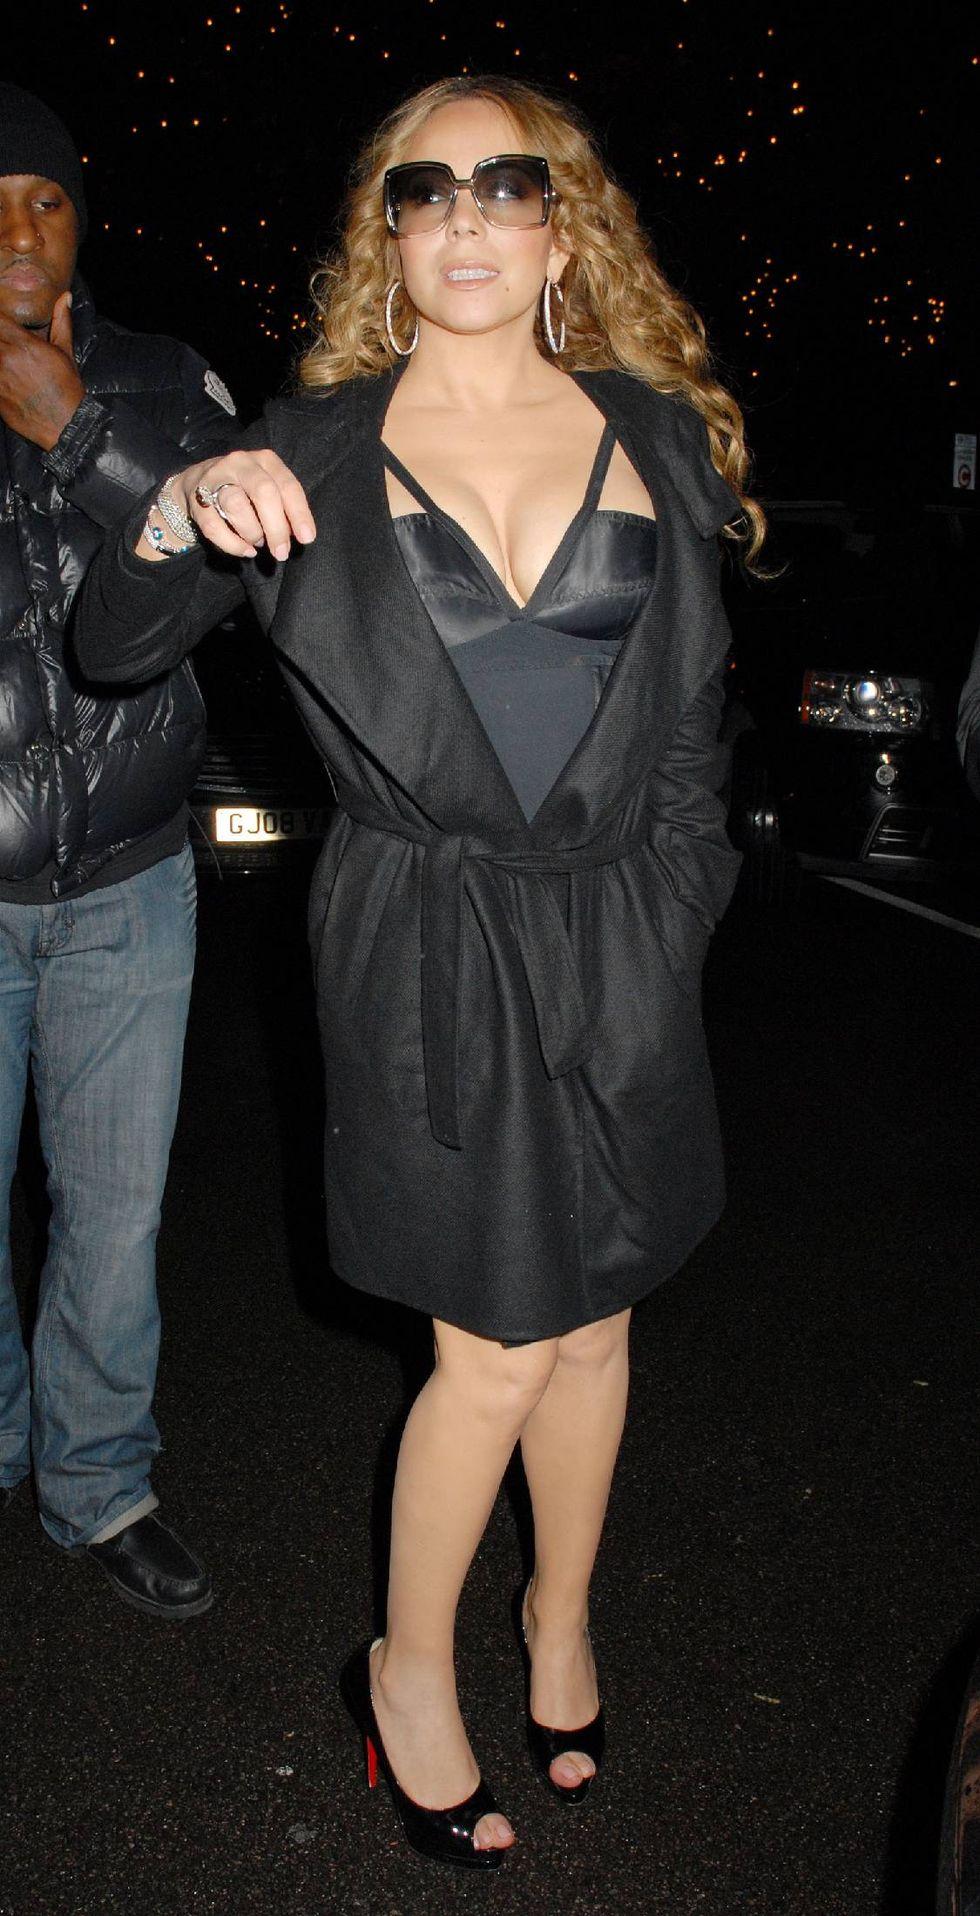 mariah-carey-cleavage-candids-in-london-05